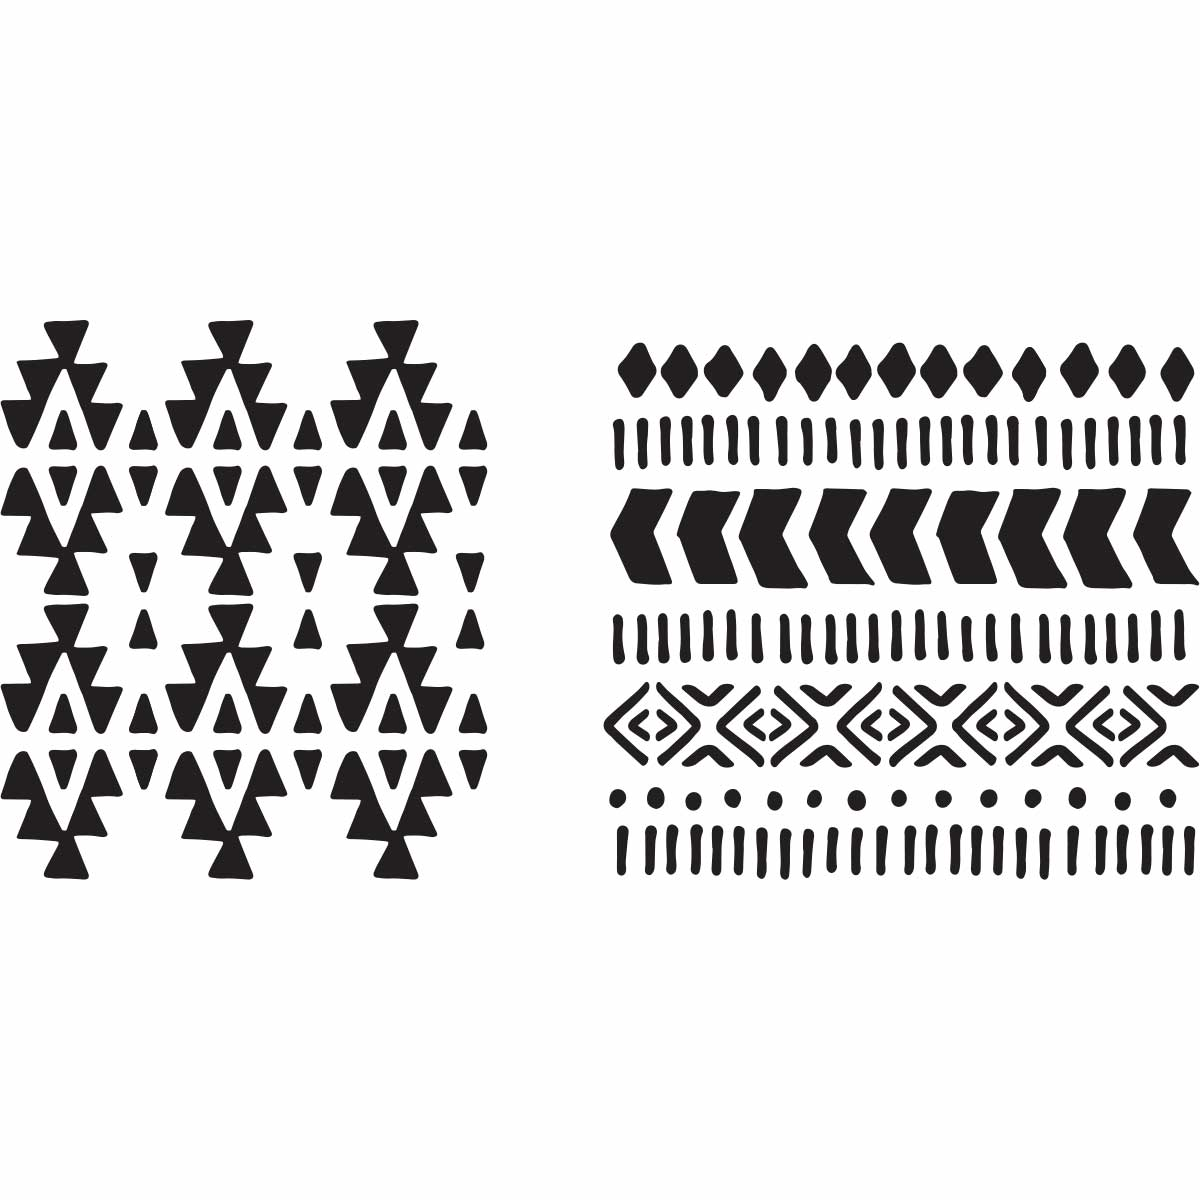 Fabric Creations™ Adhesive Stencils - Aztec, 6